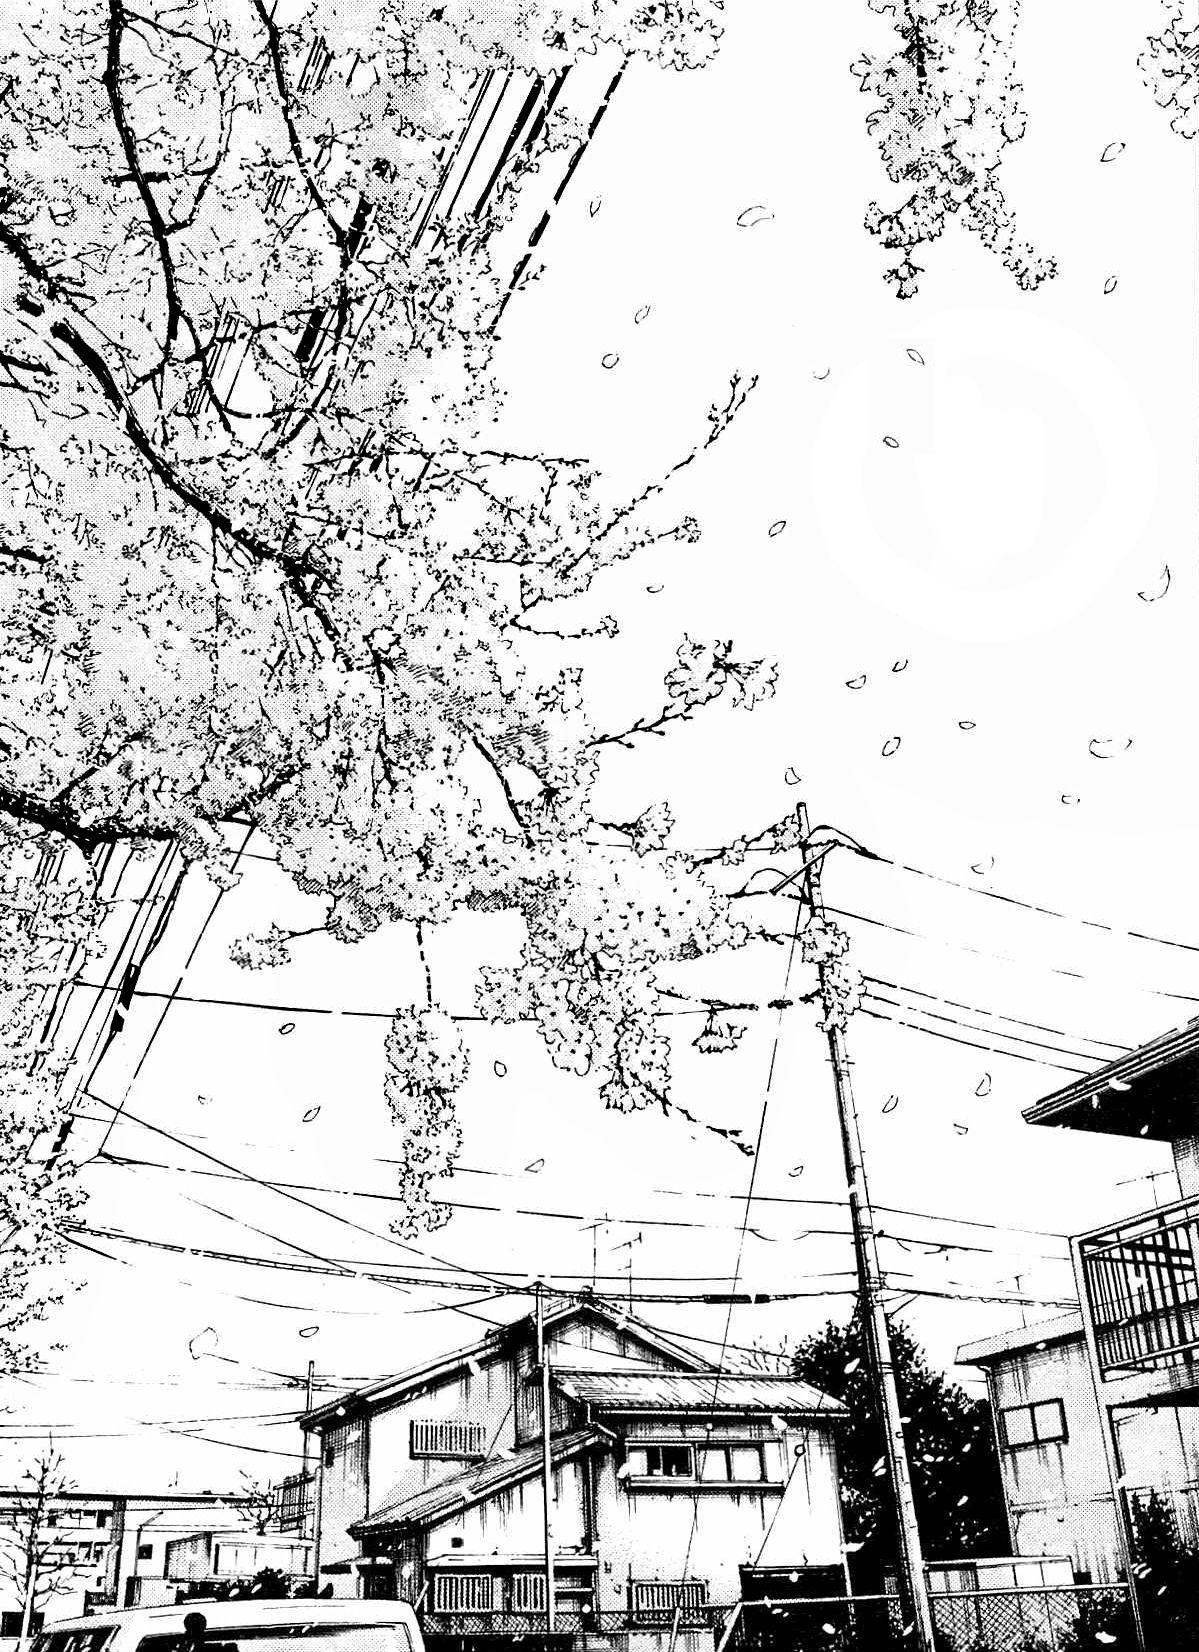 Manga Backdrop Background Textures Urban Sketch Foreground Urban Landscape Urban Sketching Landscape Paintings